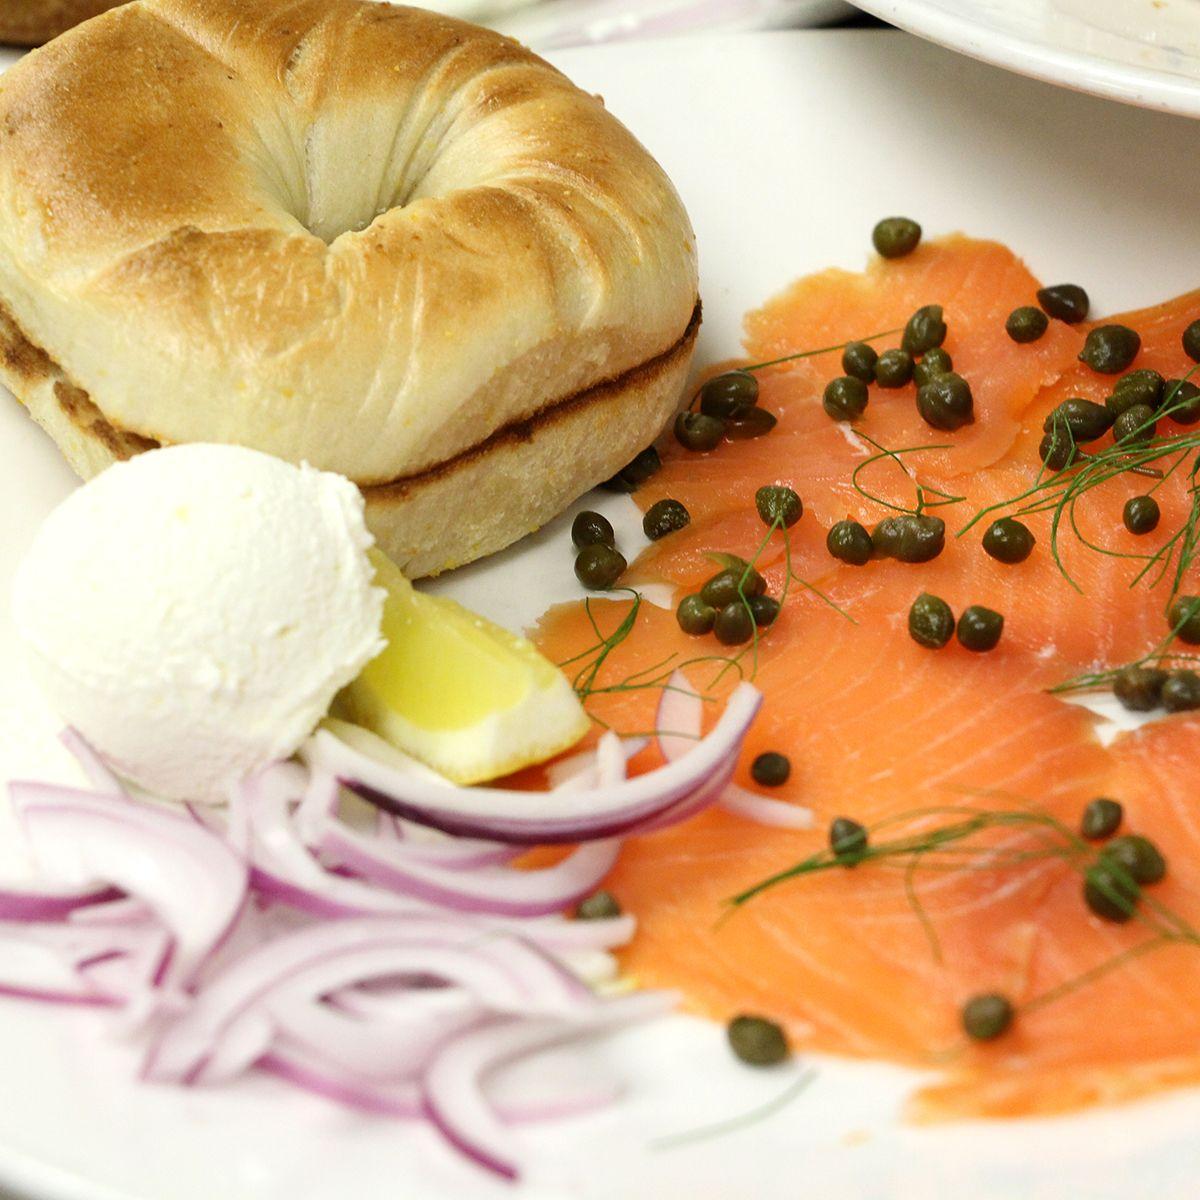 Bagel & Lox to knock your morning socks off! http://bytheblueseasantamonica.com/restaurants-terrazza.html